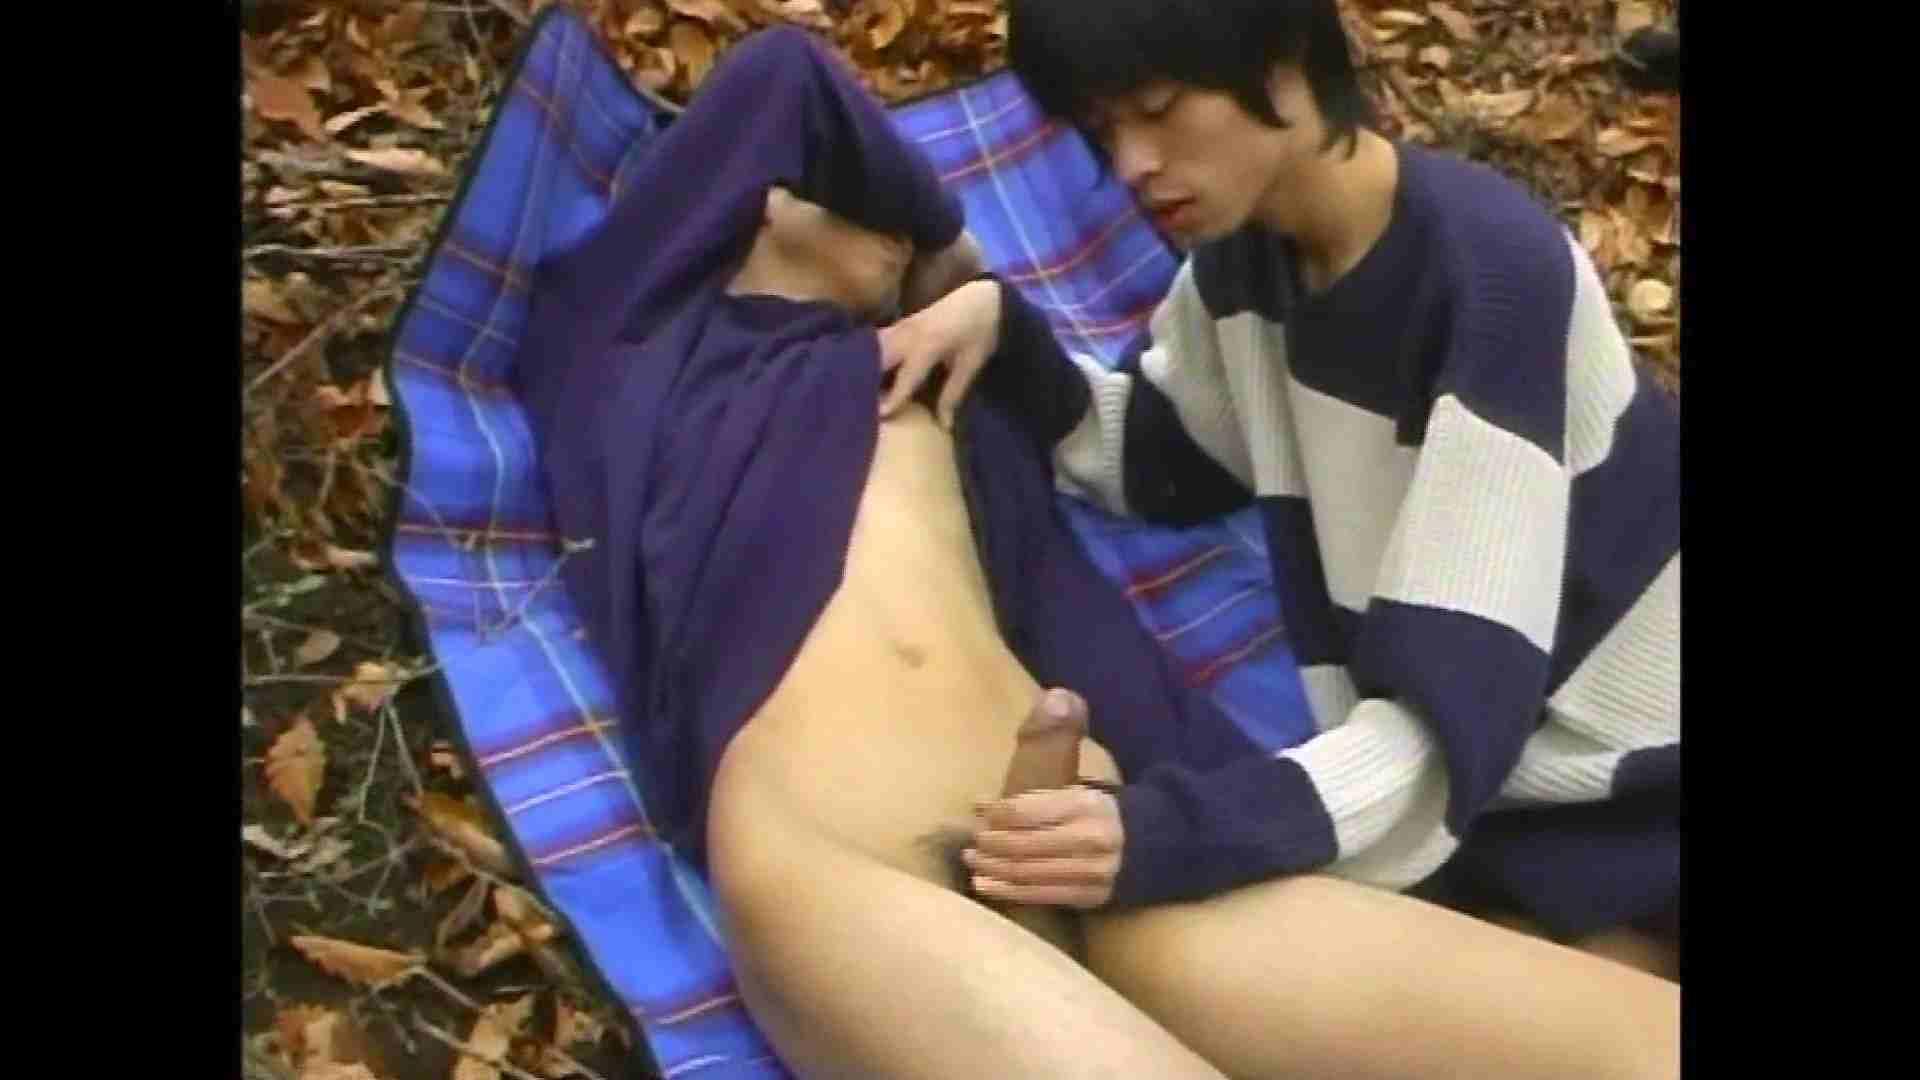 GAYBOY宏のオカズ倉庫Vol.5-2 ノンケ  81pic 69